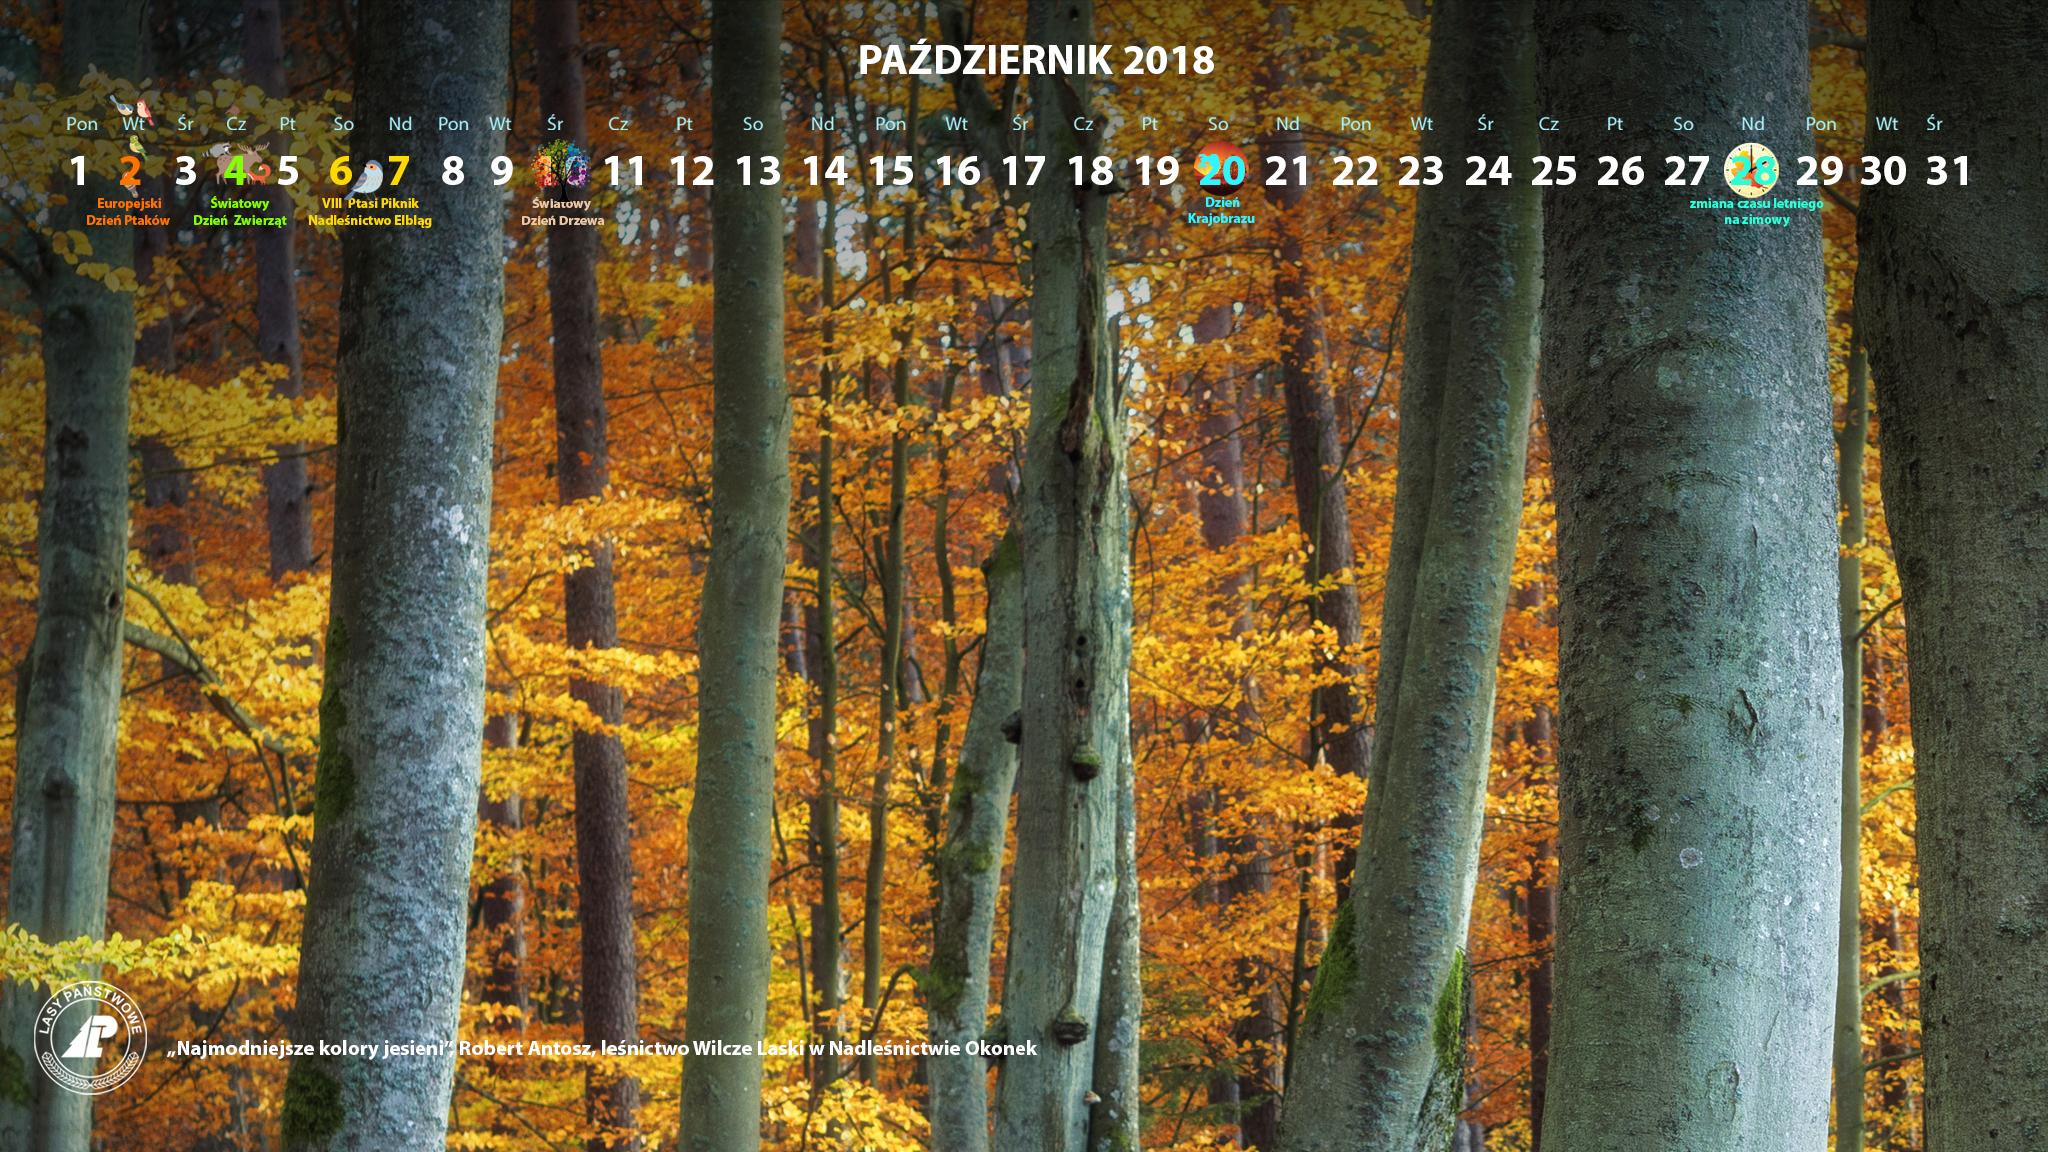 Kalendarz_październik_2018_2048x1152[1].jpg